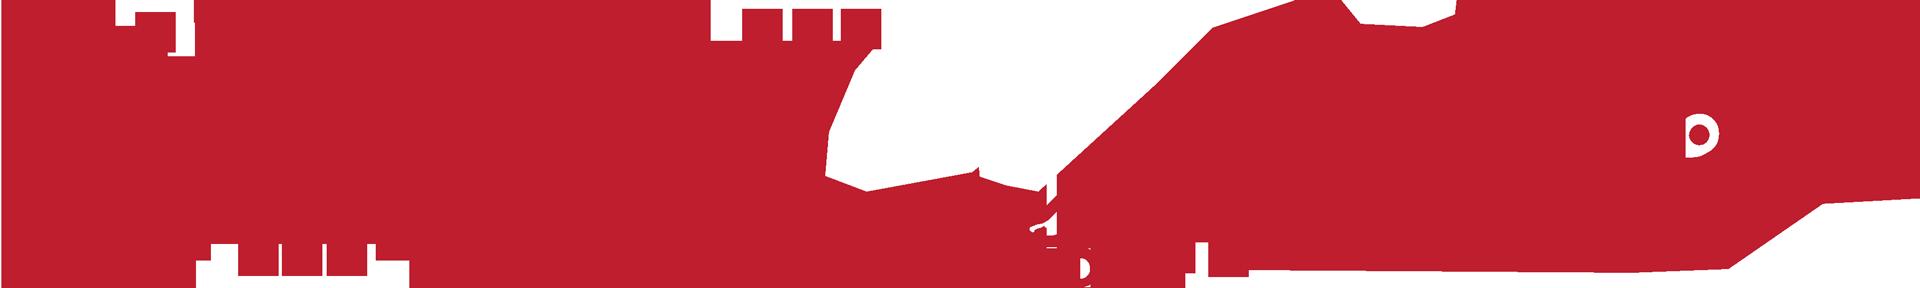 rendertank-cbottom-circuits.001.png